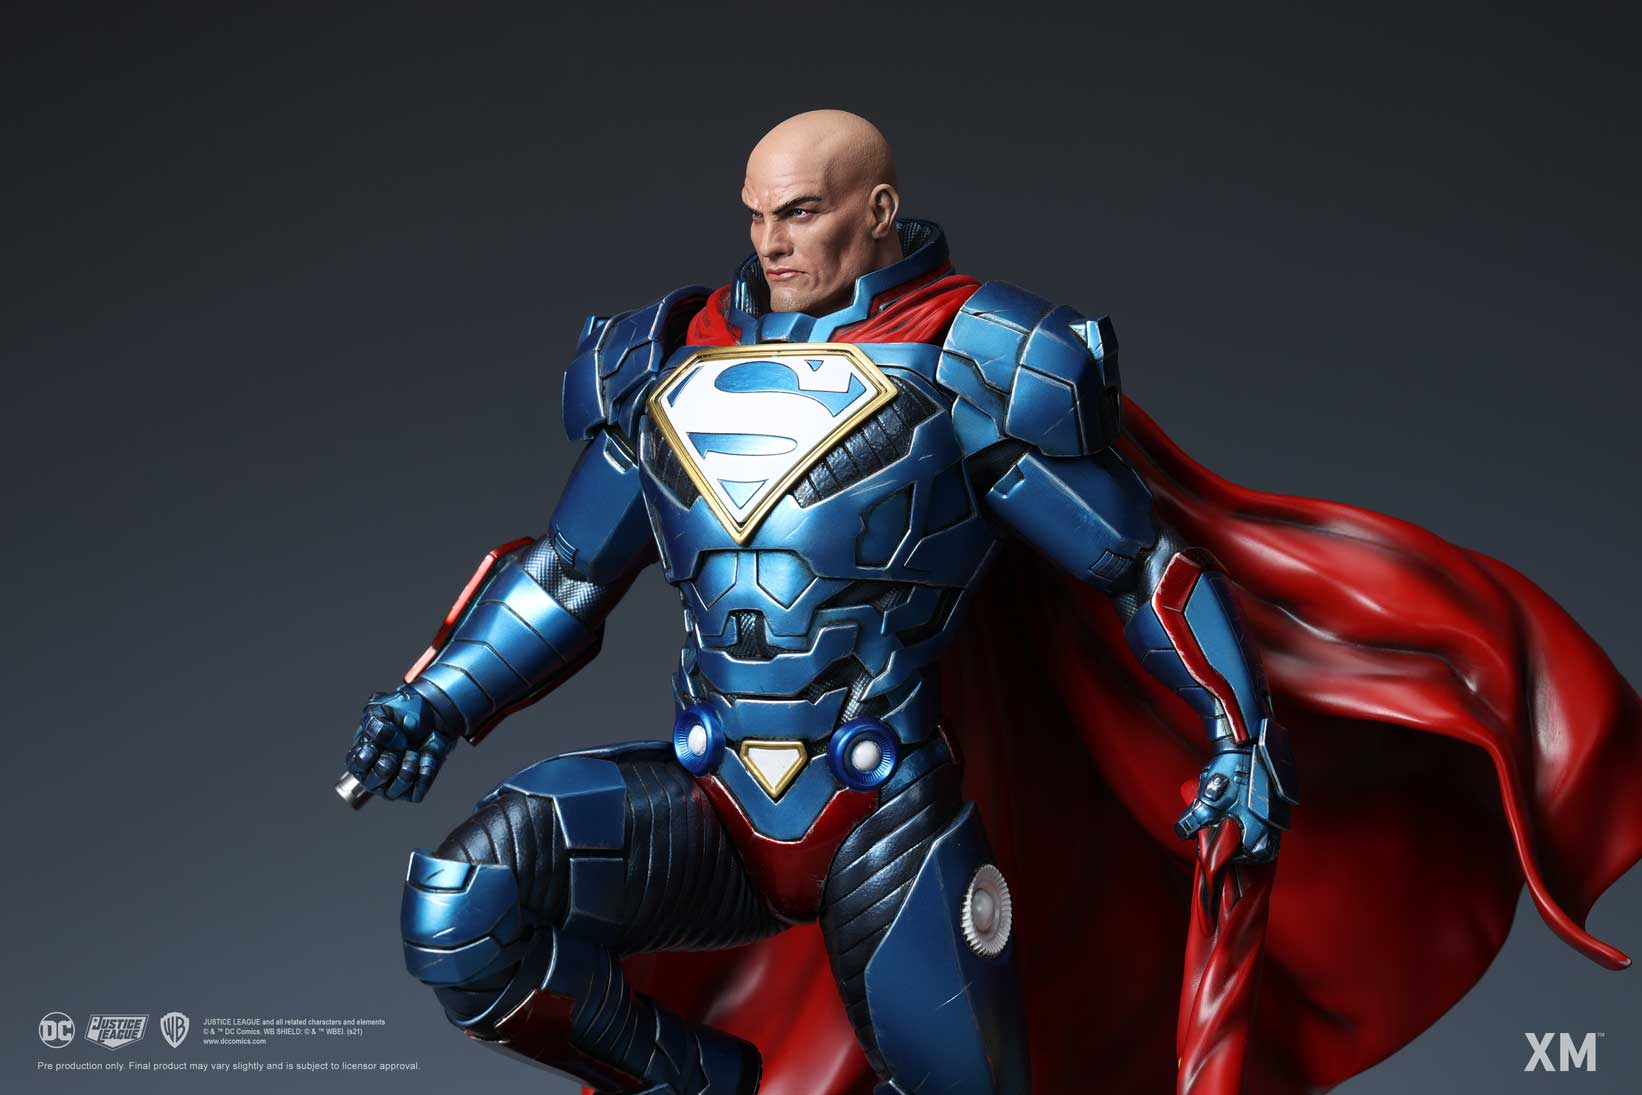 Link a Xm Studios_Lex_Luthor_Superman_DC- (10)